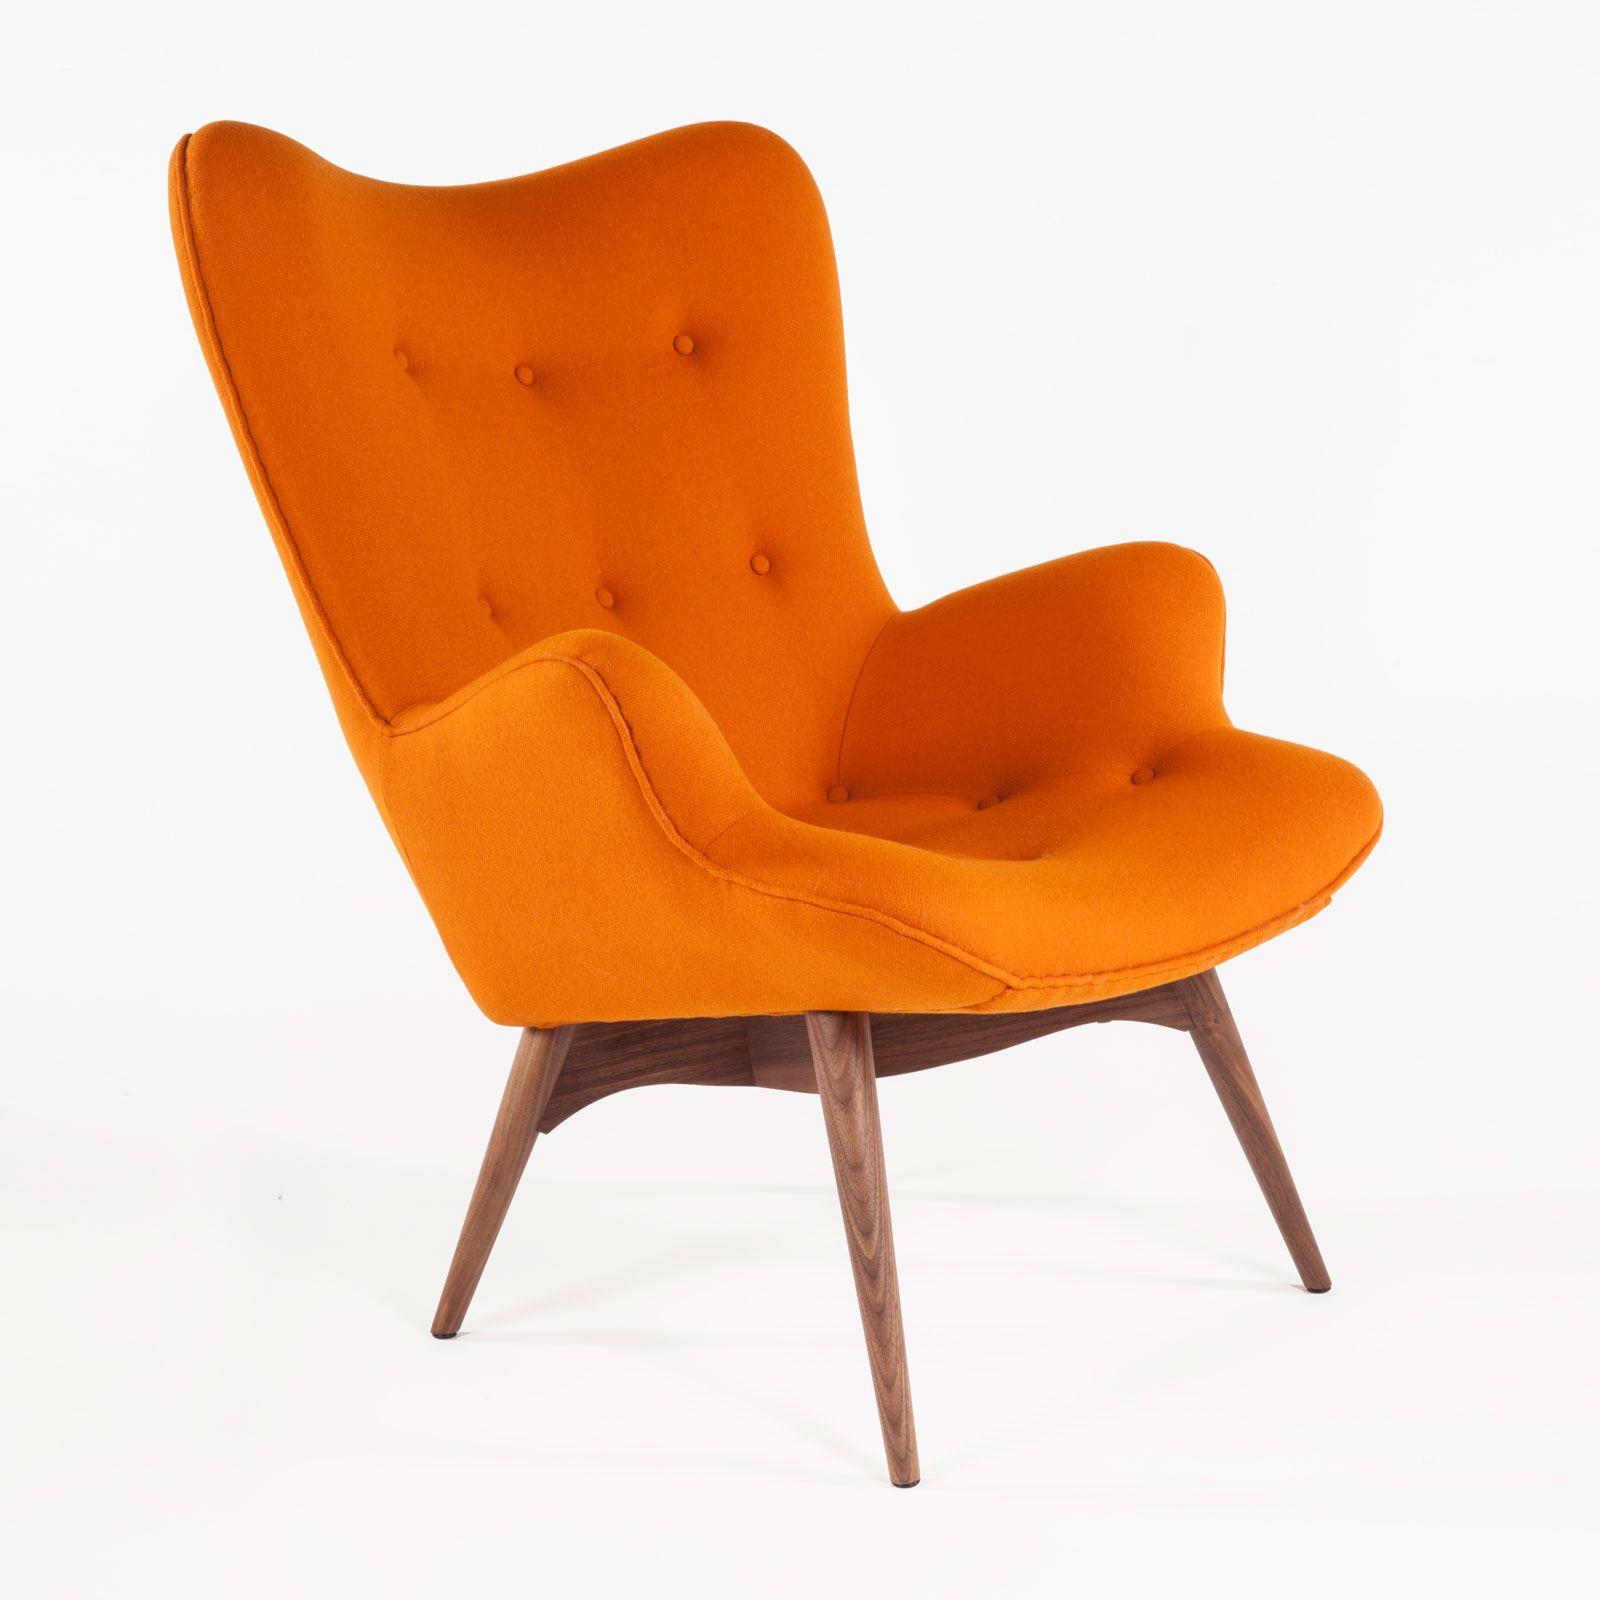 Beautiful The Teddy Bear Chair   Comfy!